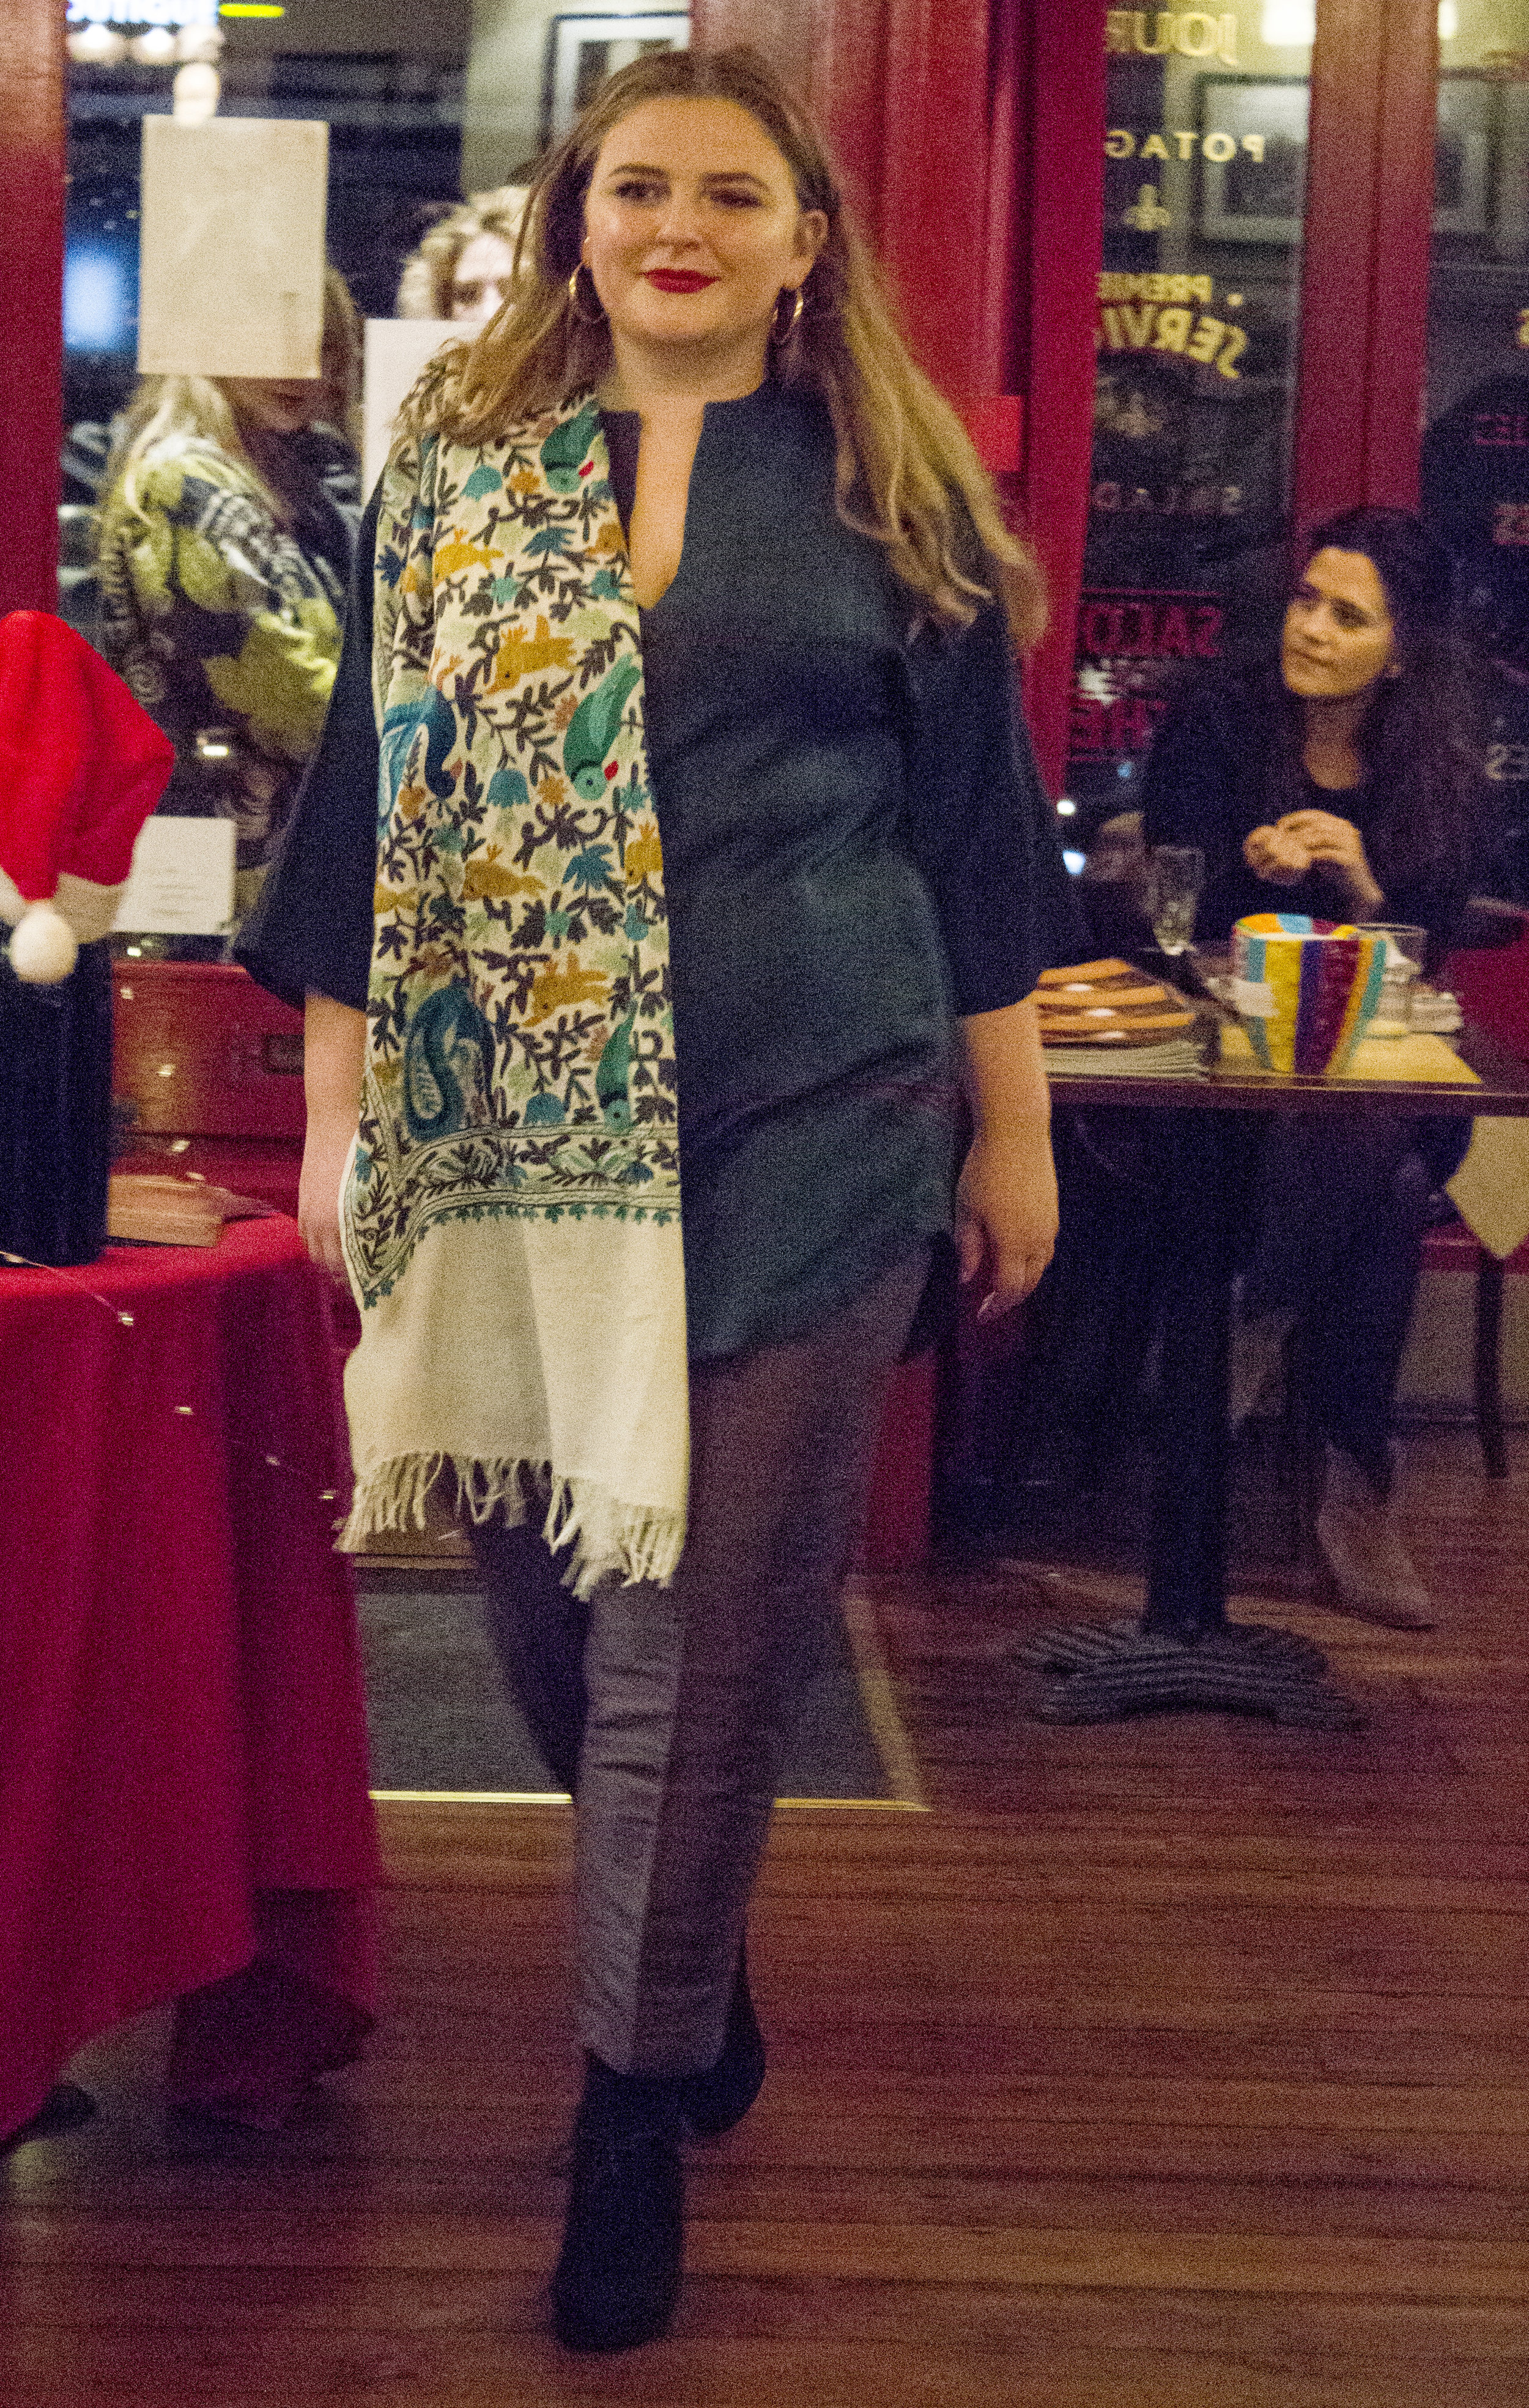 Lana wears the Jaadu silk dupion trousers, Raga wool tunic and embroidered wool shawl